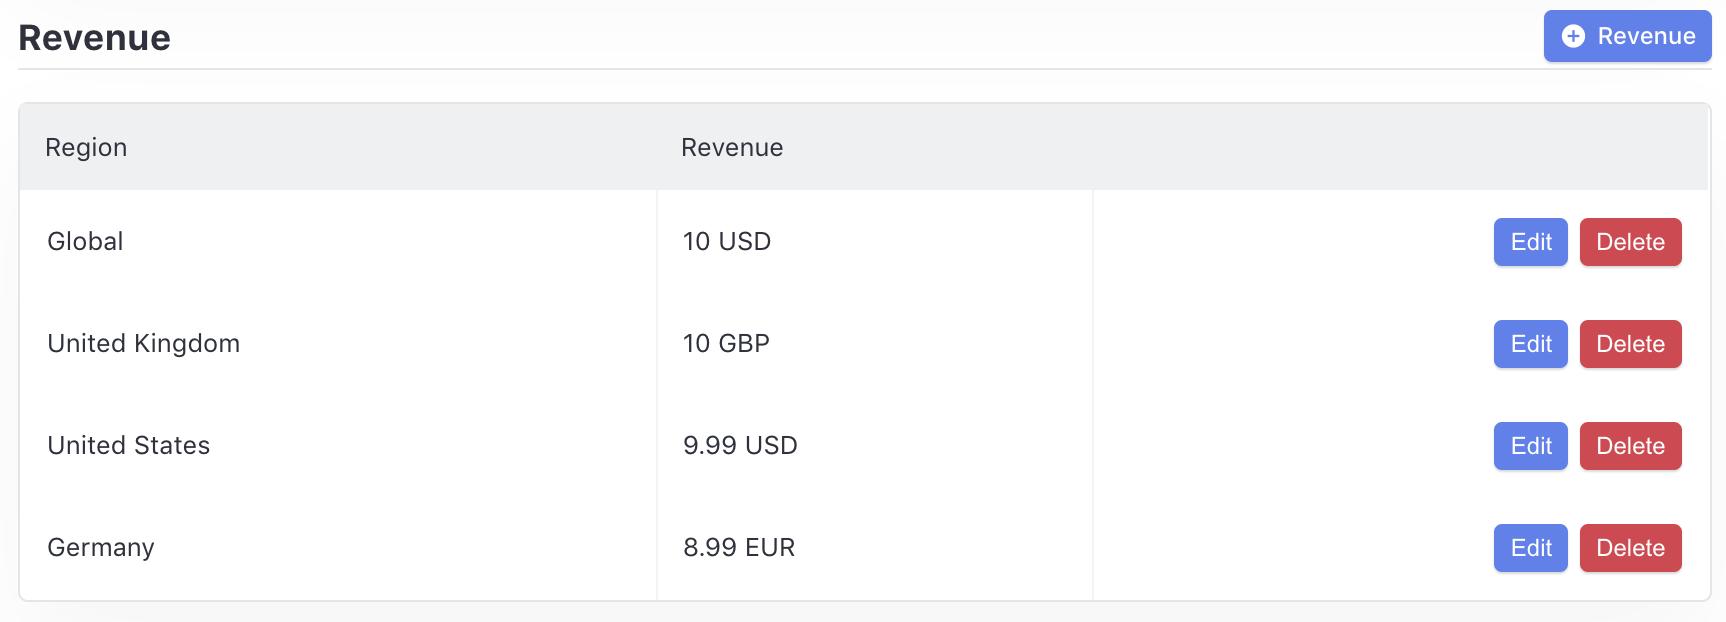 Goal revenue configuration